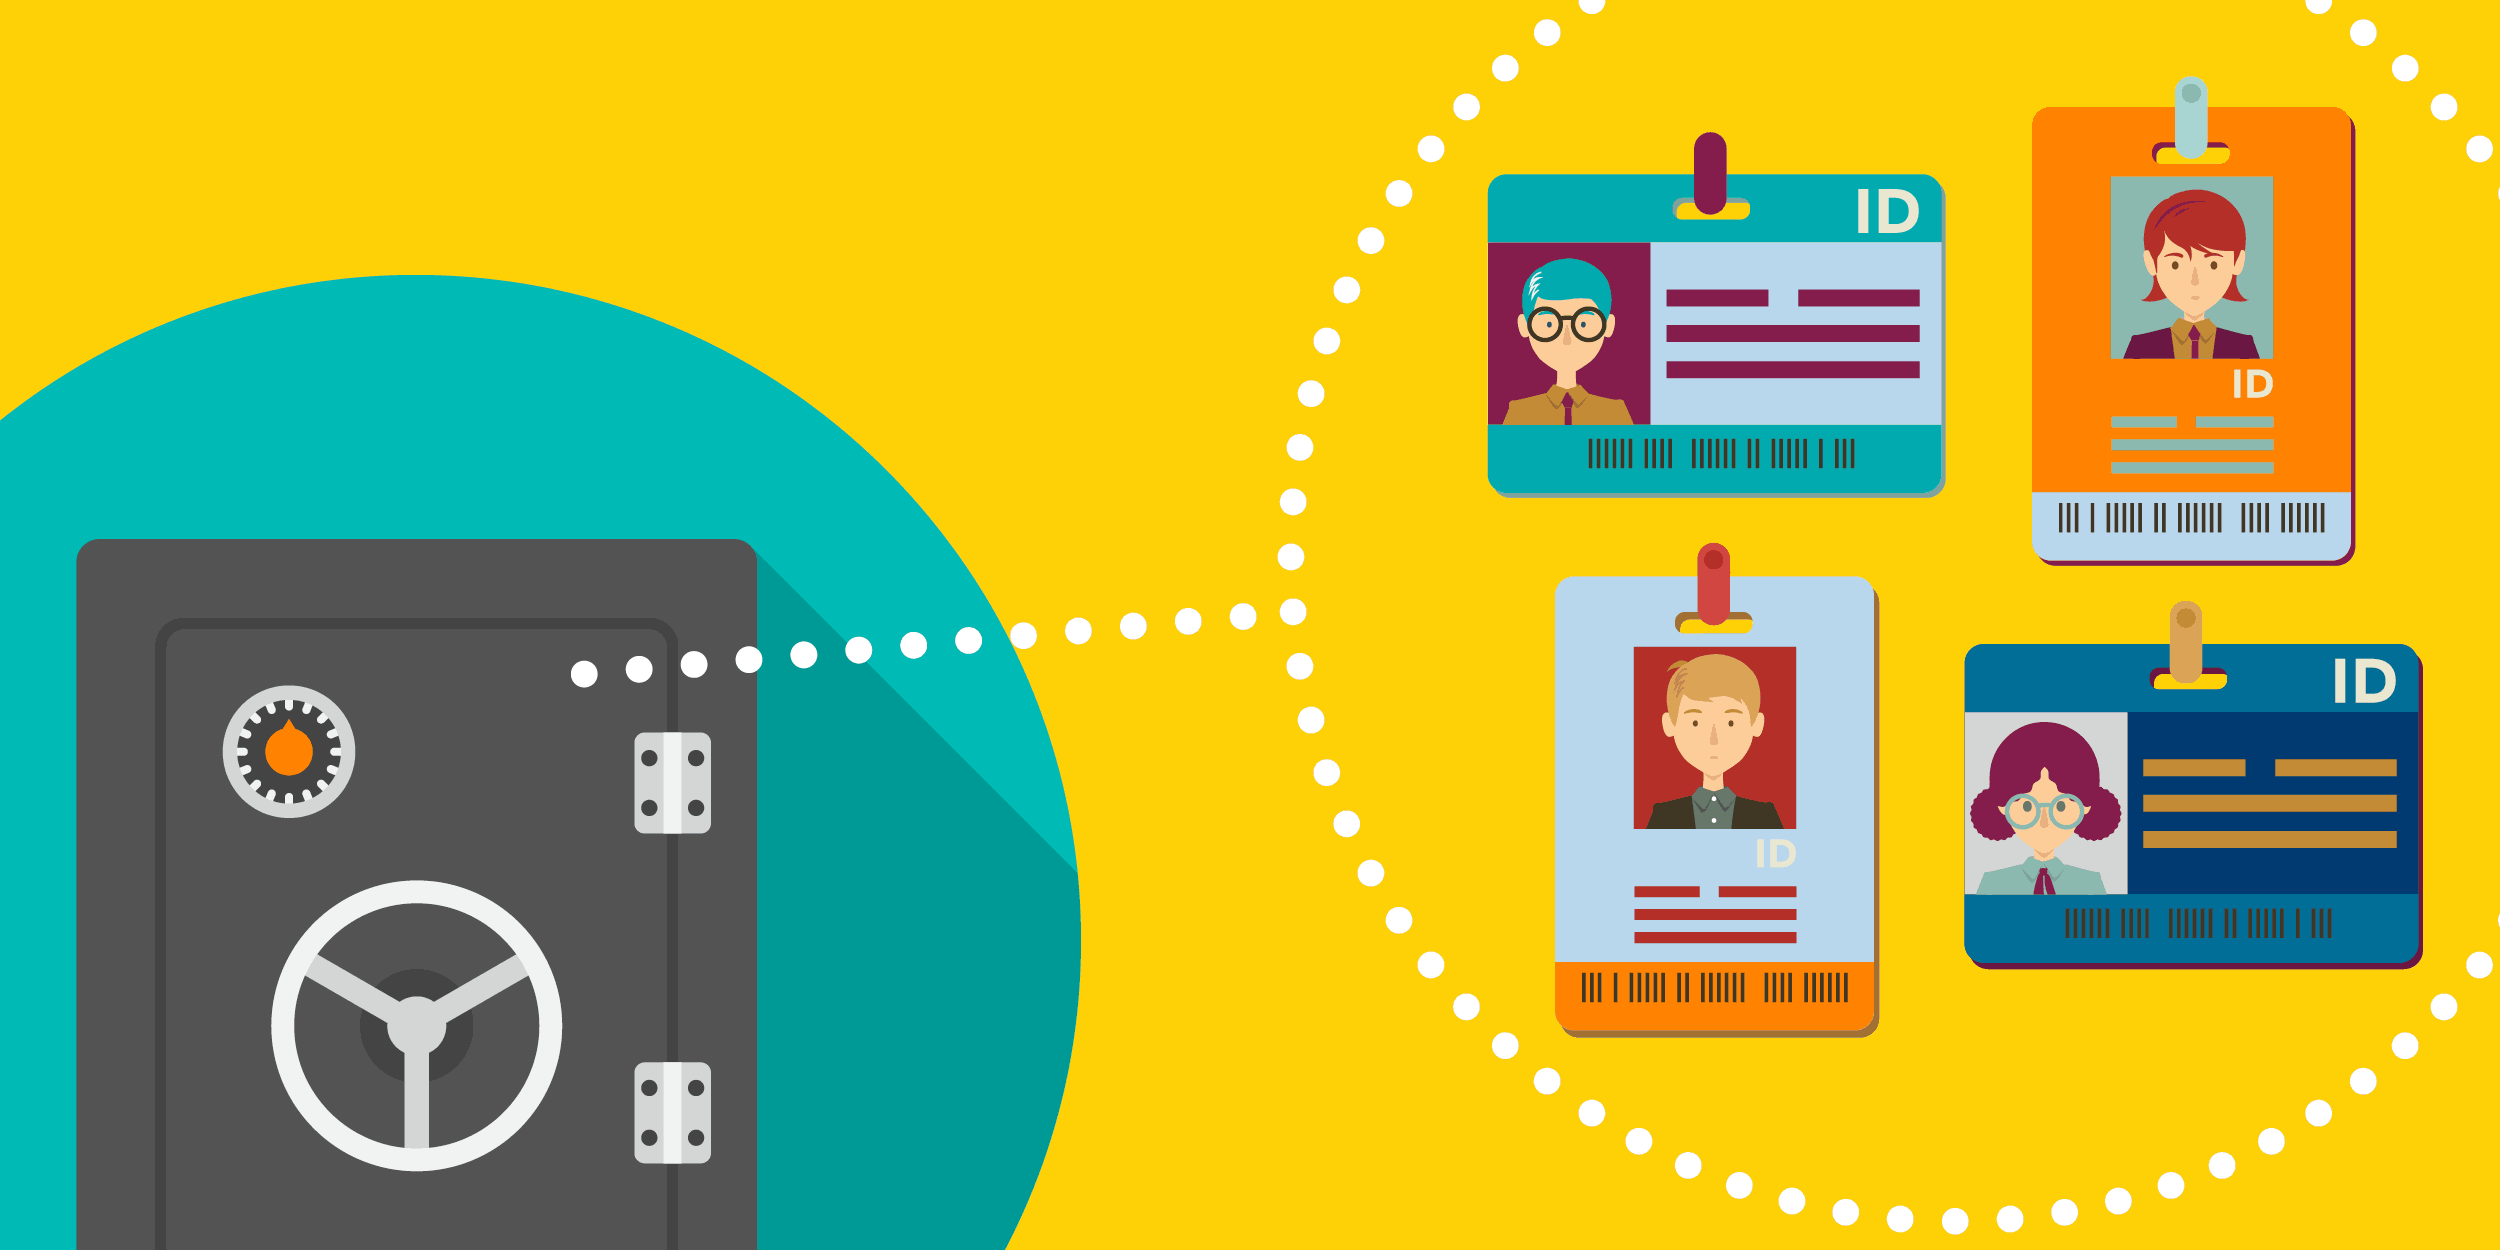 illustration of a locked vault keeping people's identify safe, symbolizing data security for nonprofits